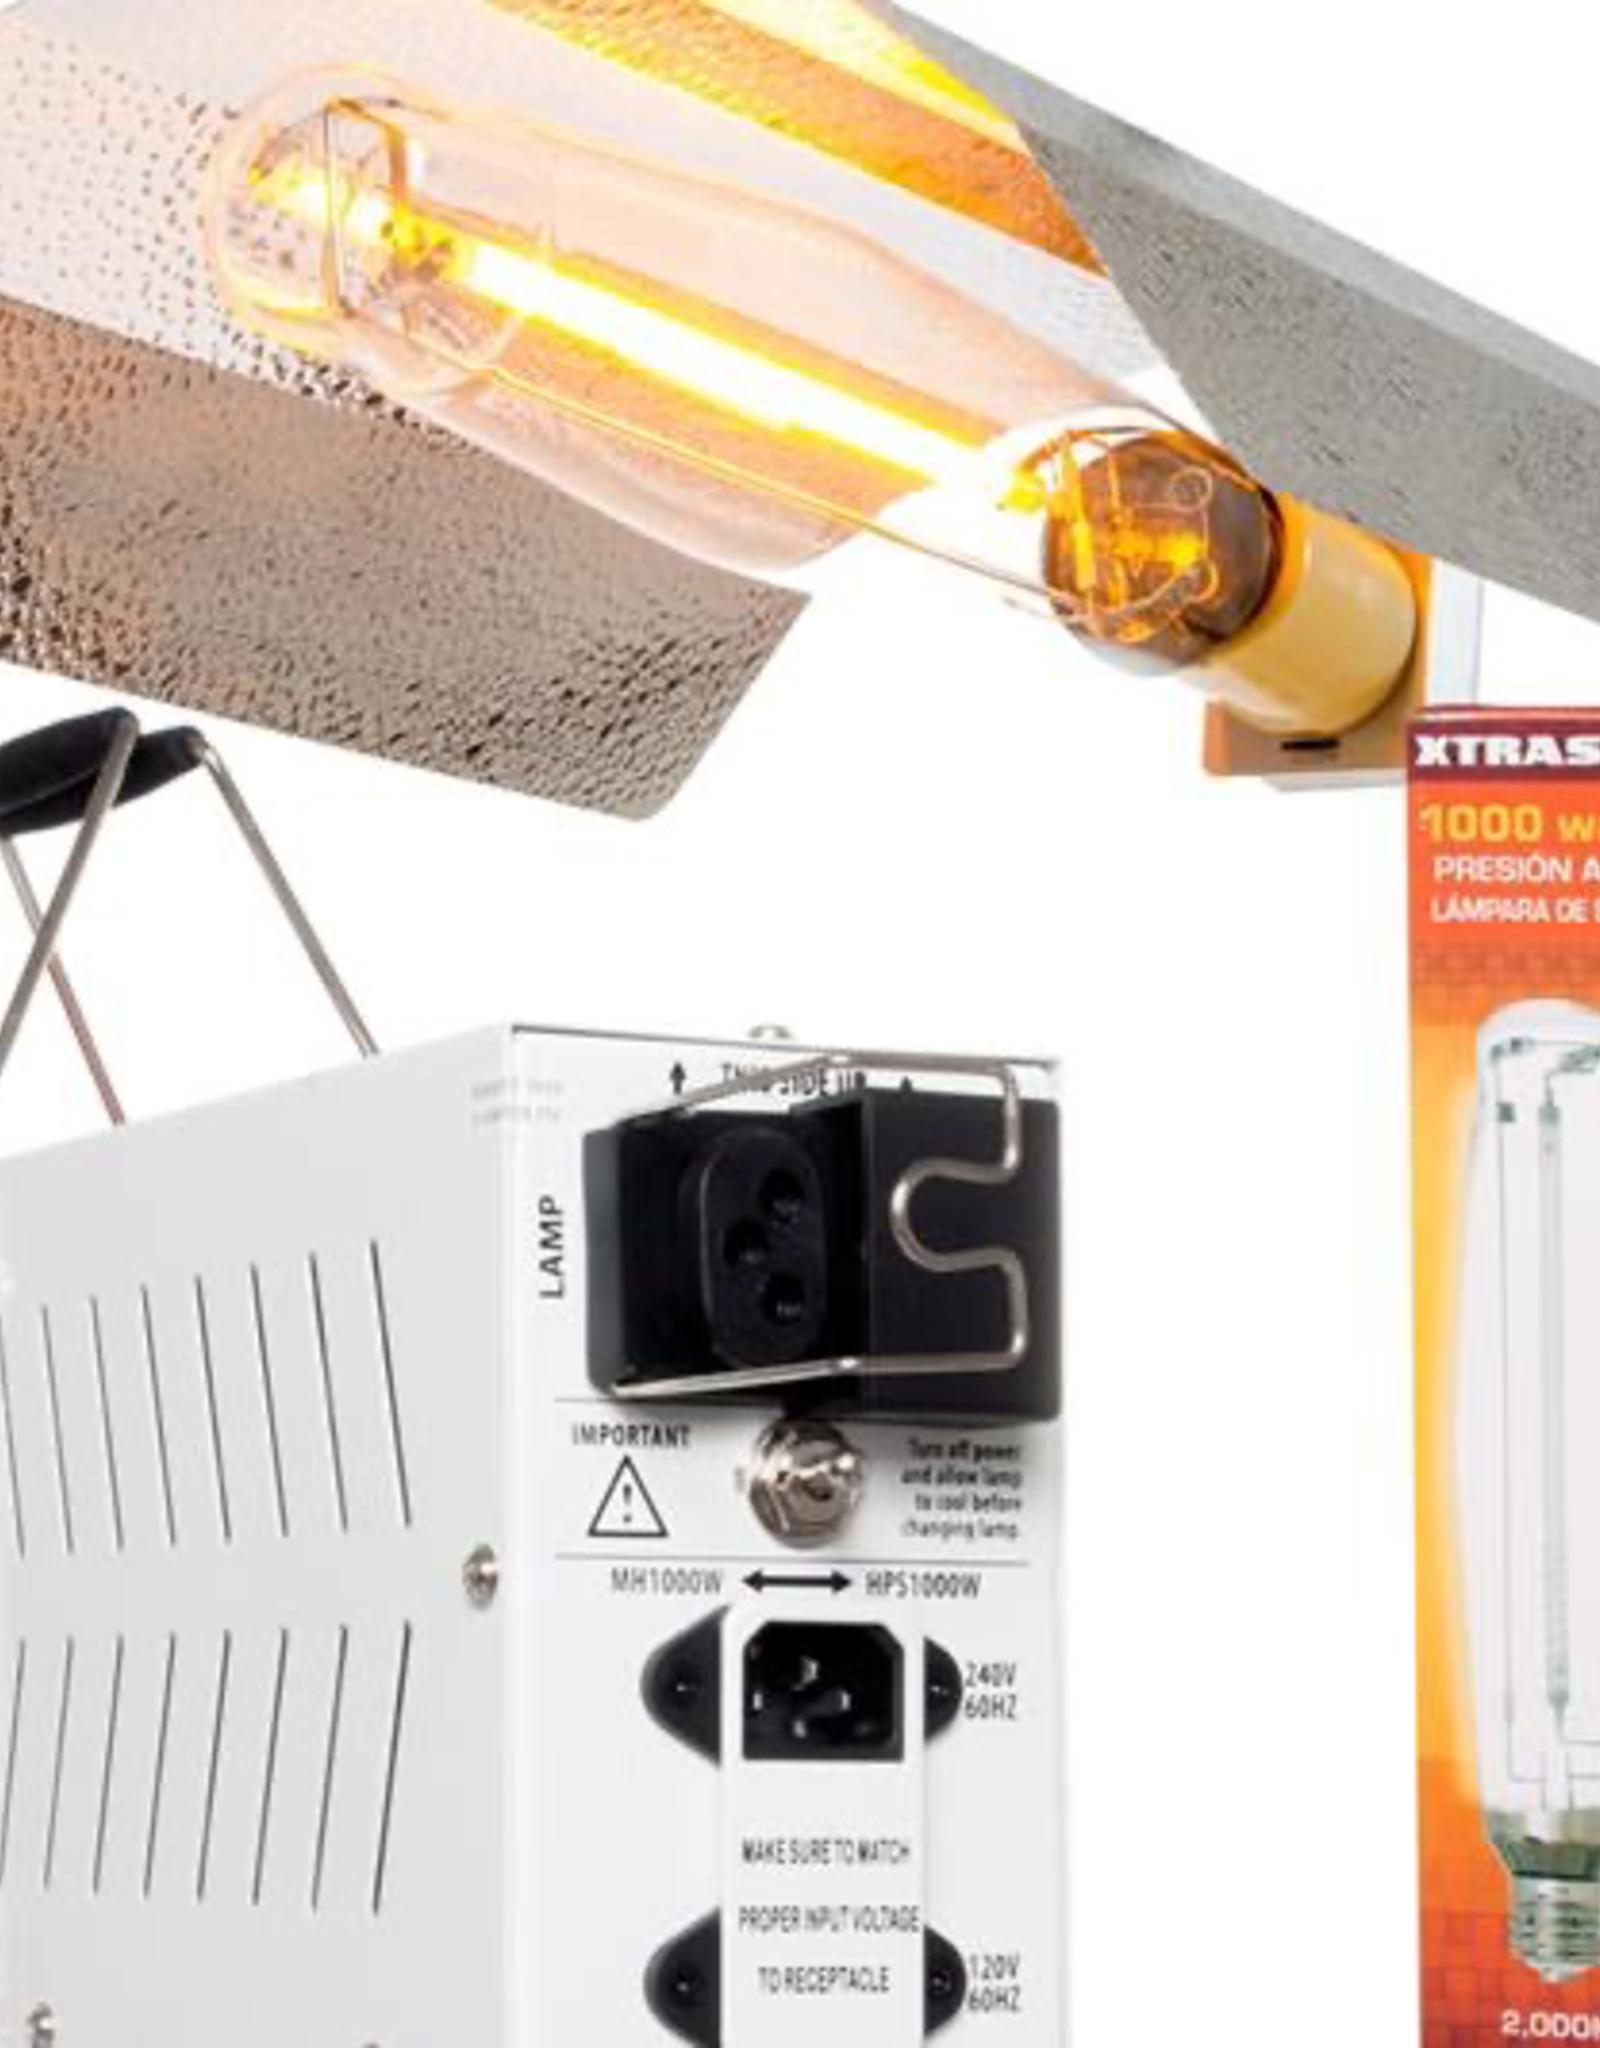 XTRASUN Xtrasun HPS Lighting System, 1000W, Convertible, 120V/240V